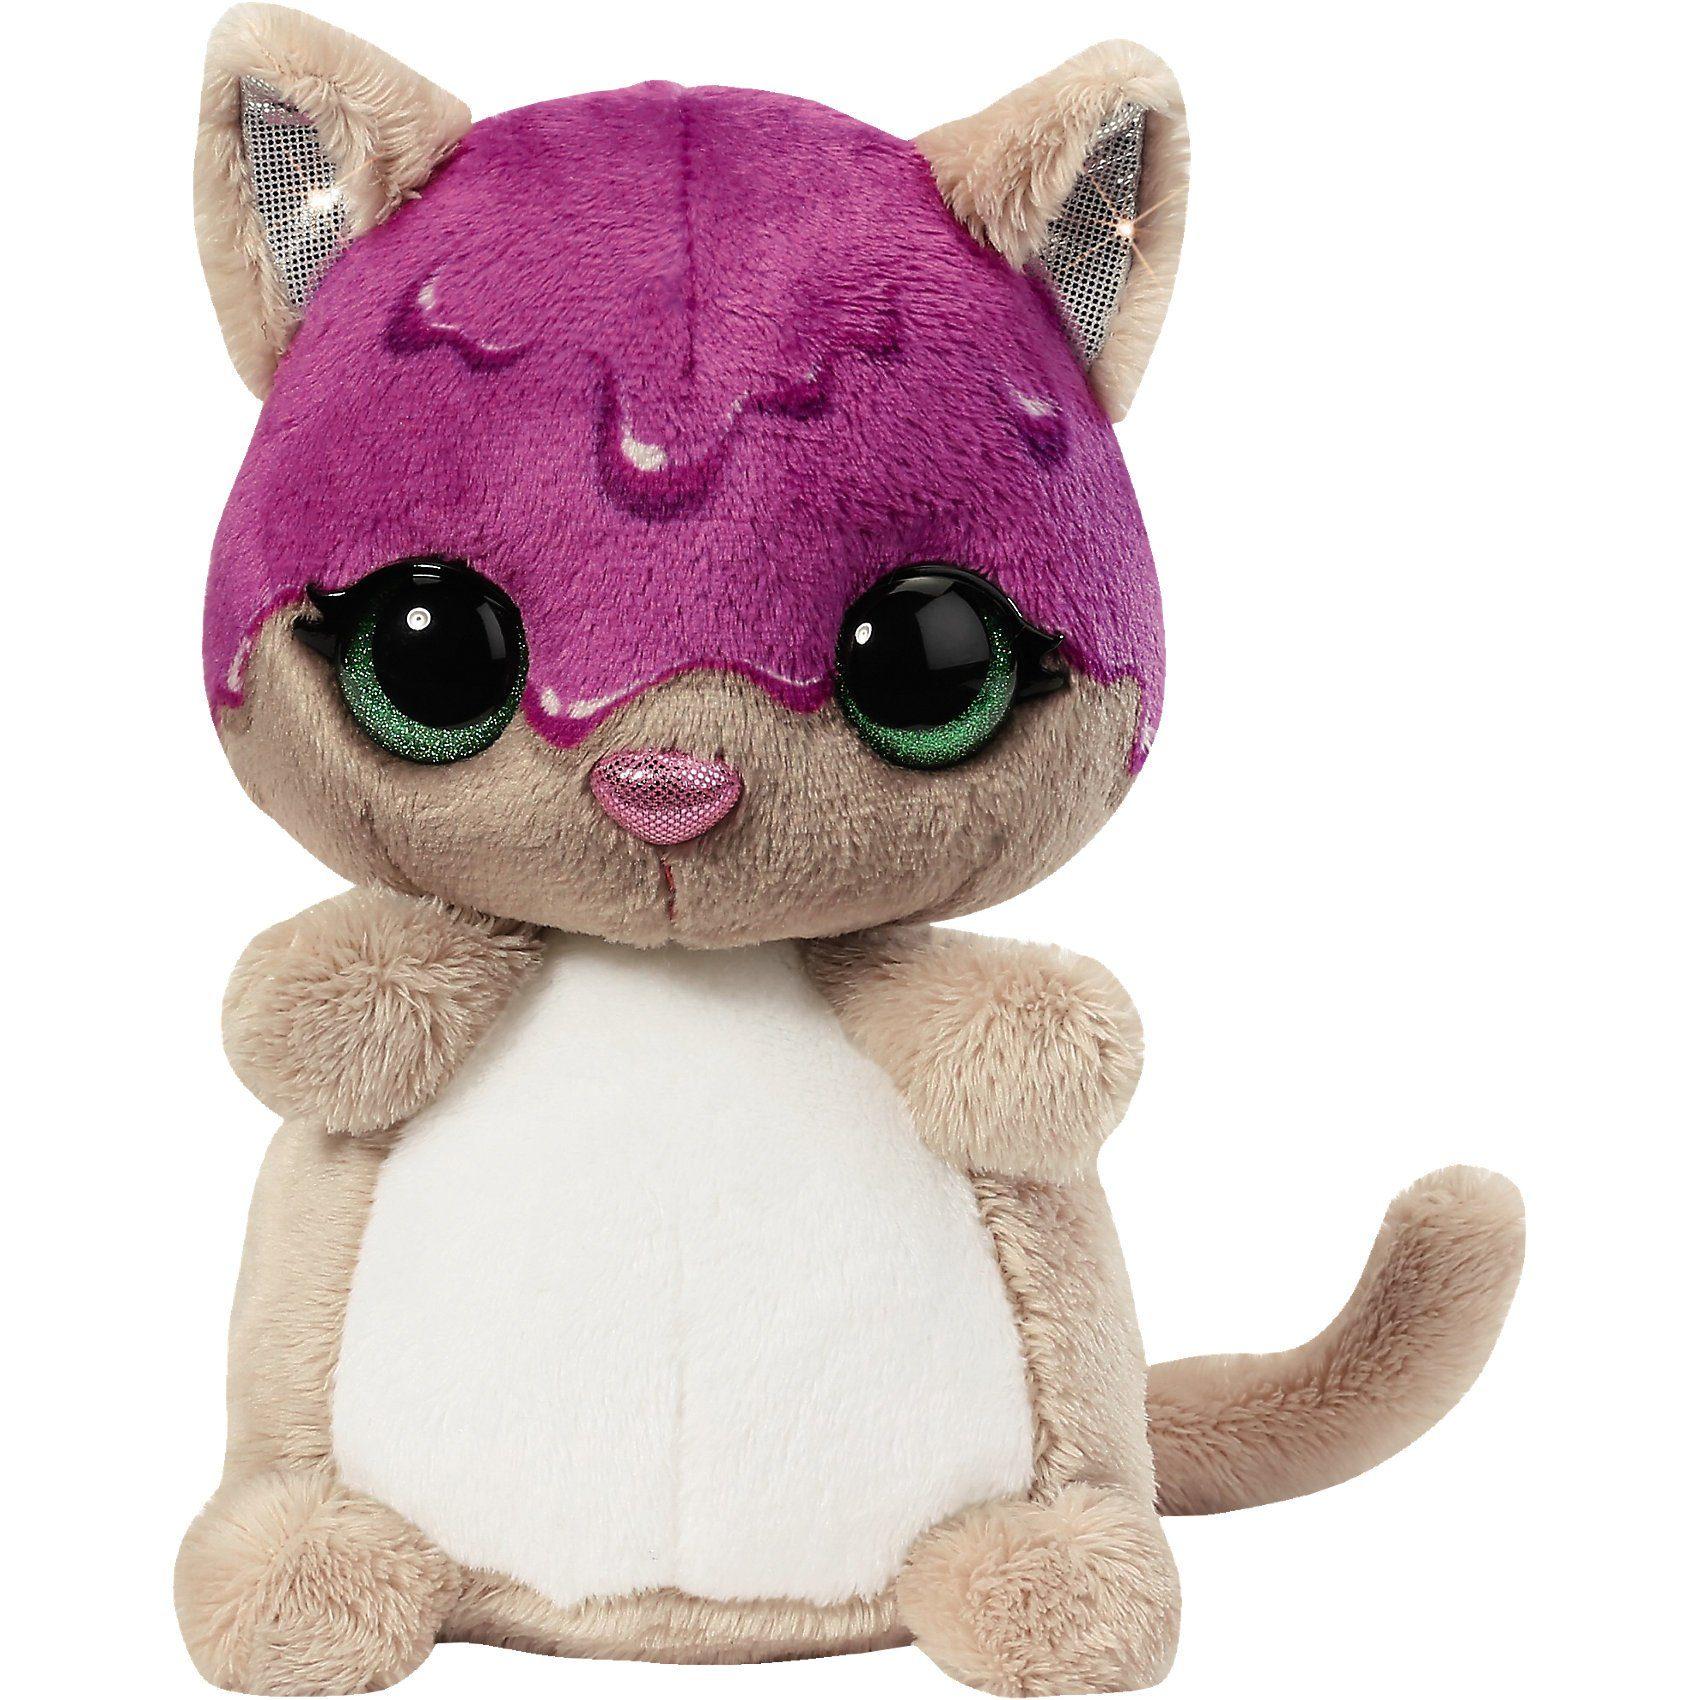 NICI doos Sirup Katze Maffle 16cm (38437)